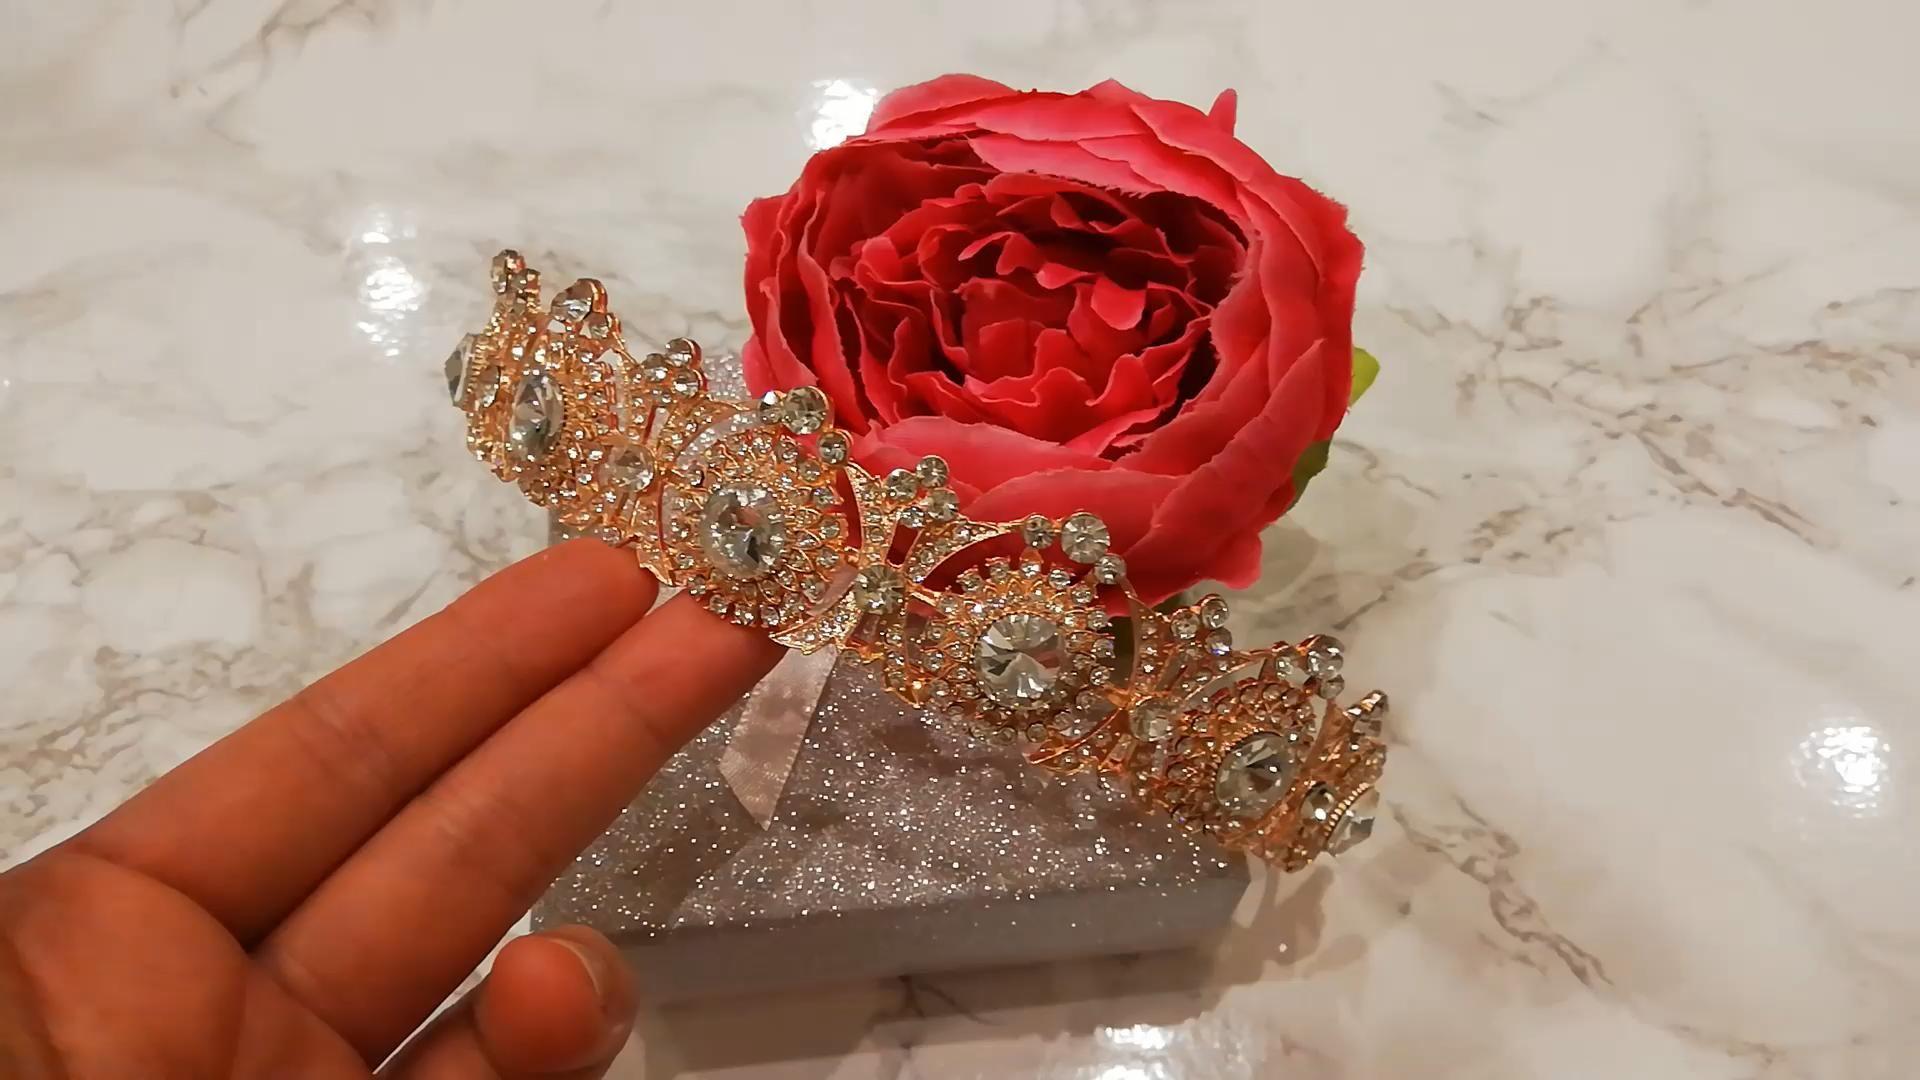 Royal inspired Wedding Tiara, Rose Gold Tiara, Silver Tiara - Bride 2020 - Bride 2021 Bridal trends -   15 makeup Gold brides ideas